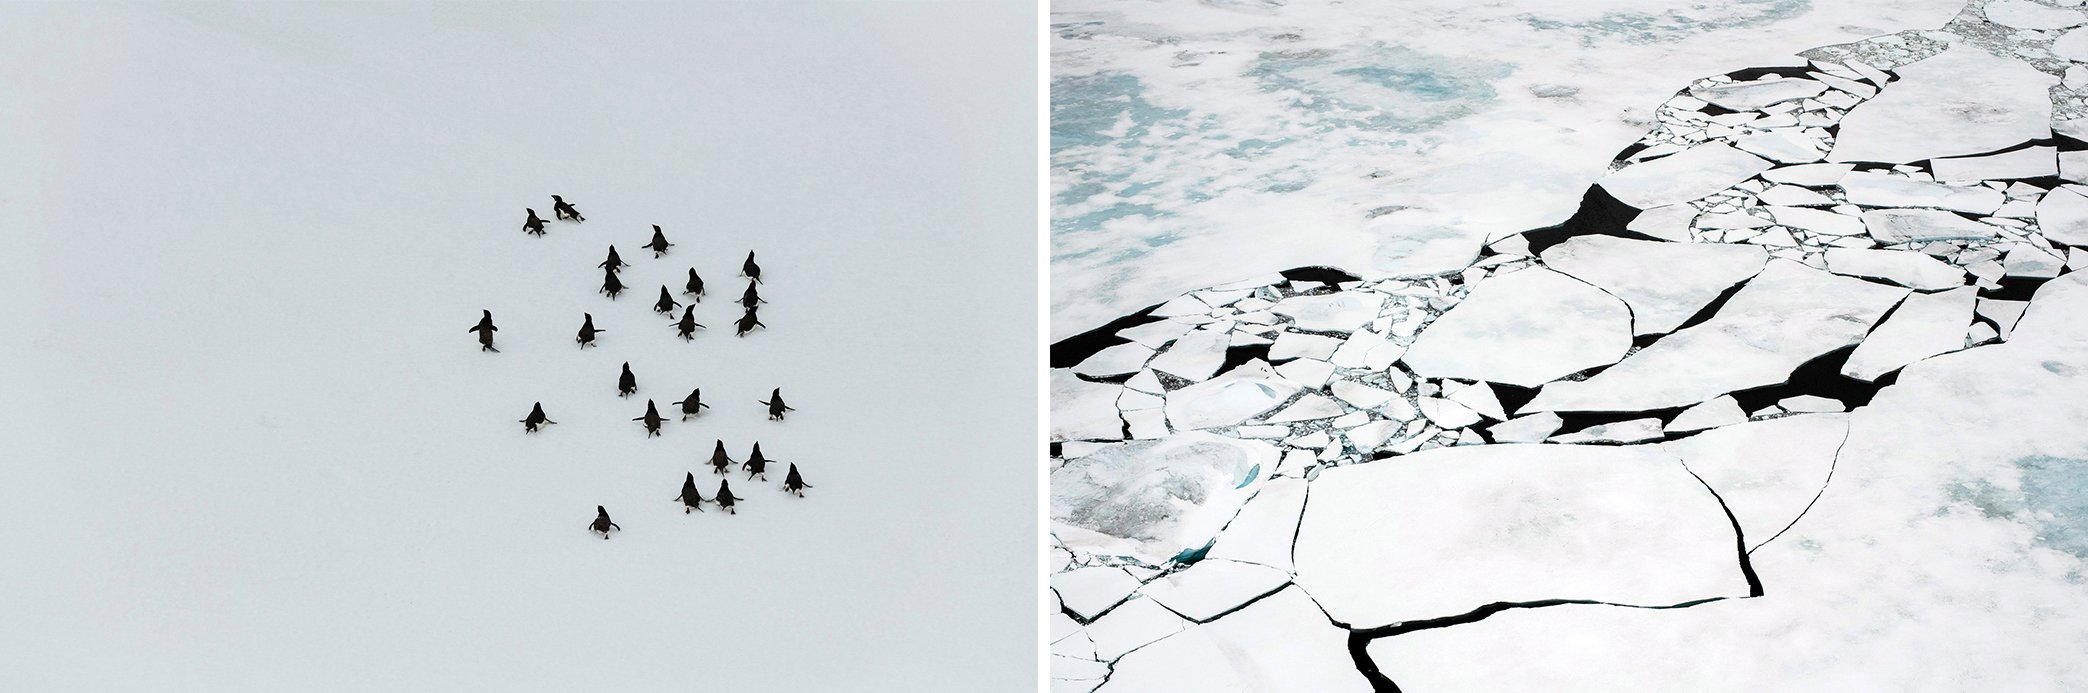 Antarctica_Greenpeace_Diptych.jpg